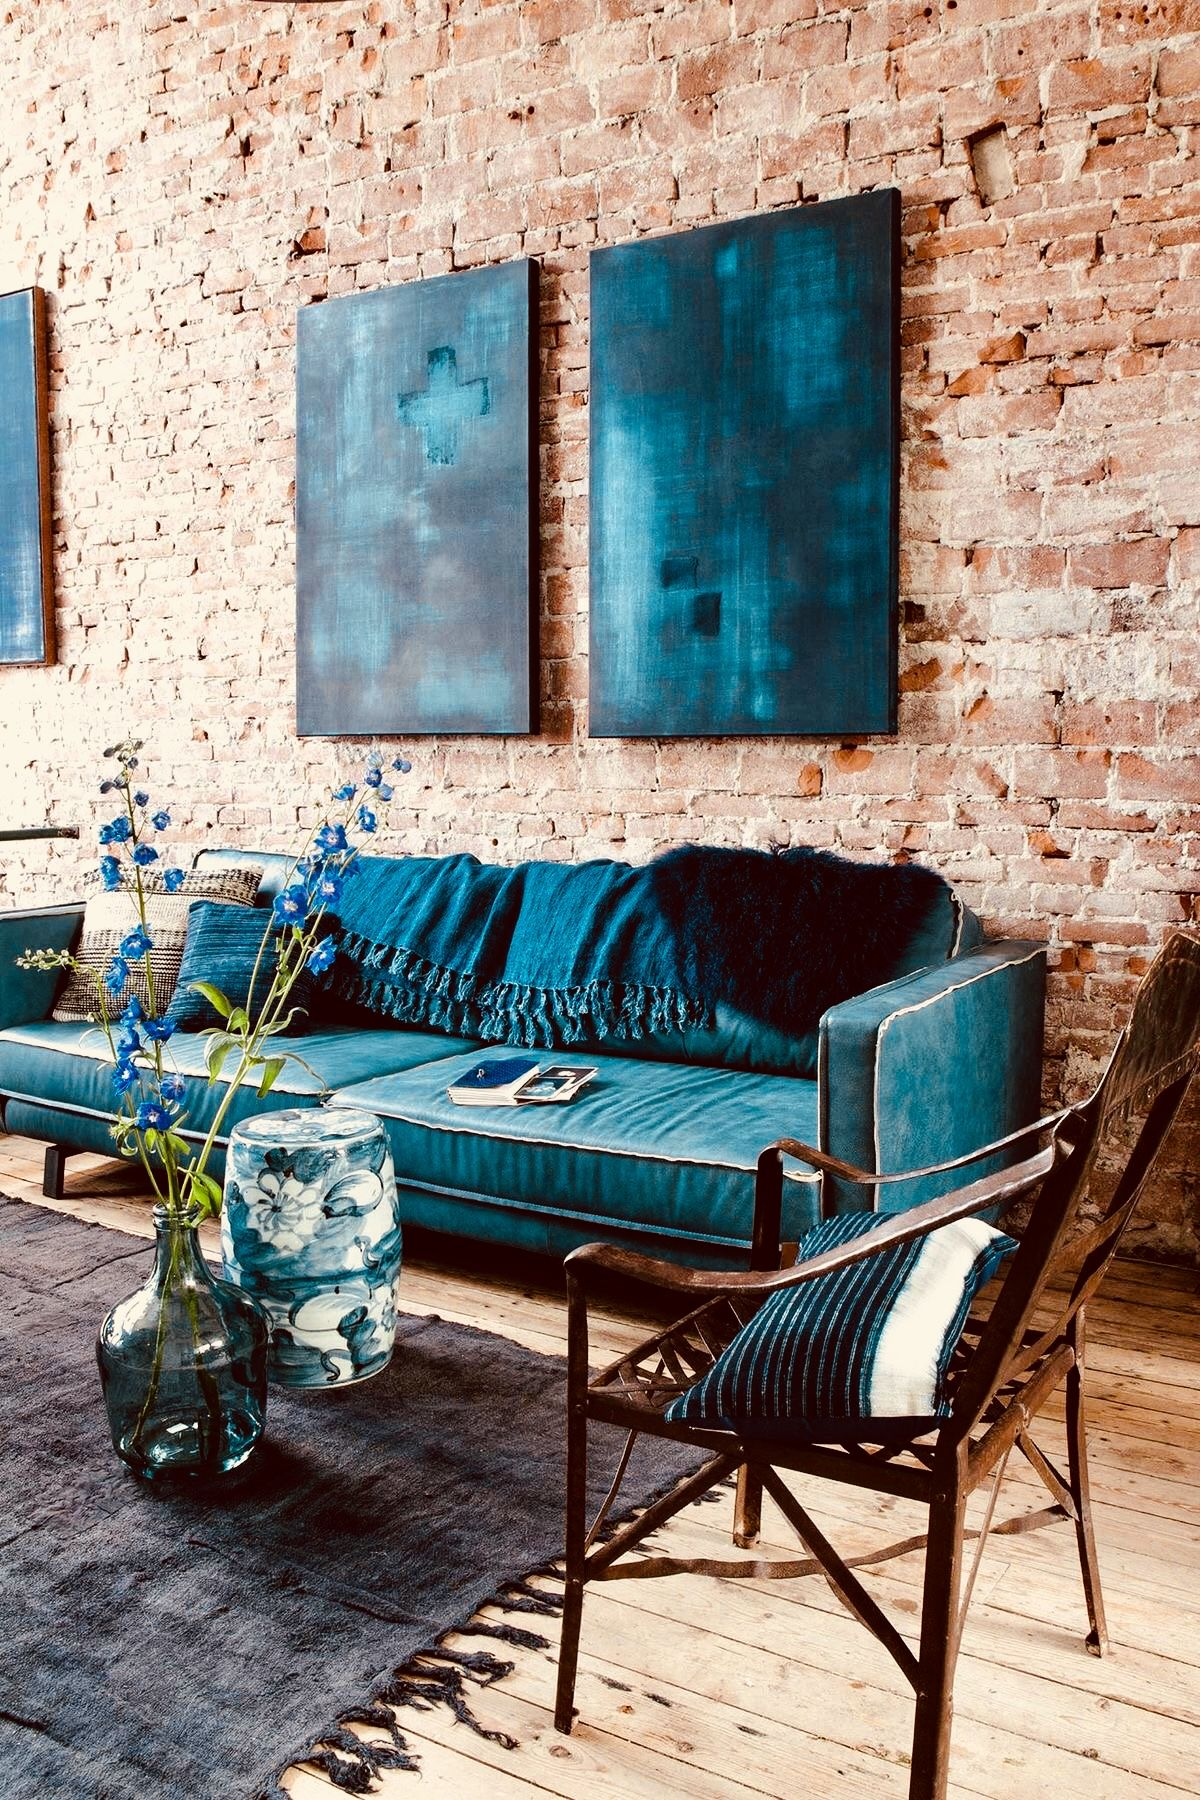 Living Room Home Decor House Decoration Mid Century Modern Teal Sofa Artwork Exposed Brick Blue Living Room Decor Wall Decor Living Room Home Decor #teal #sofa #living #room